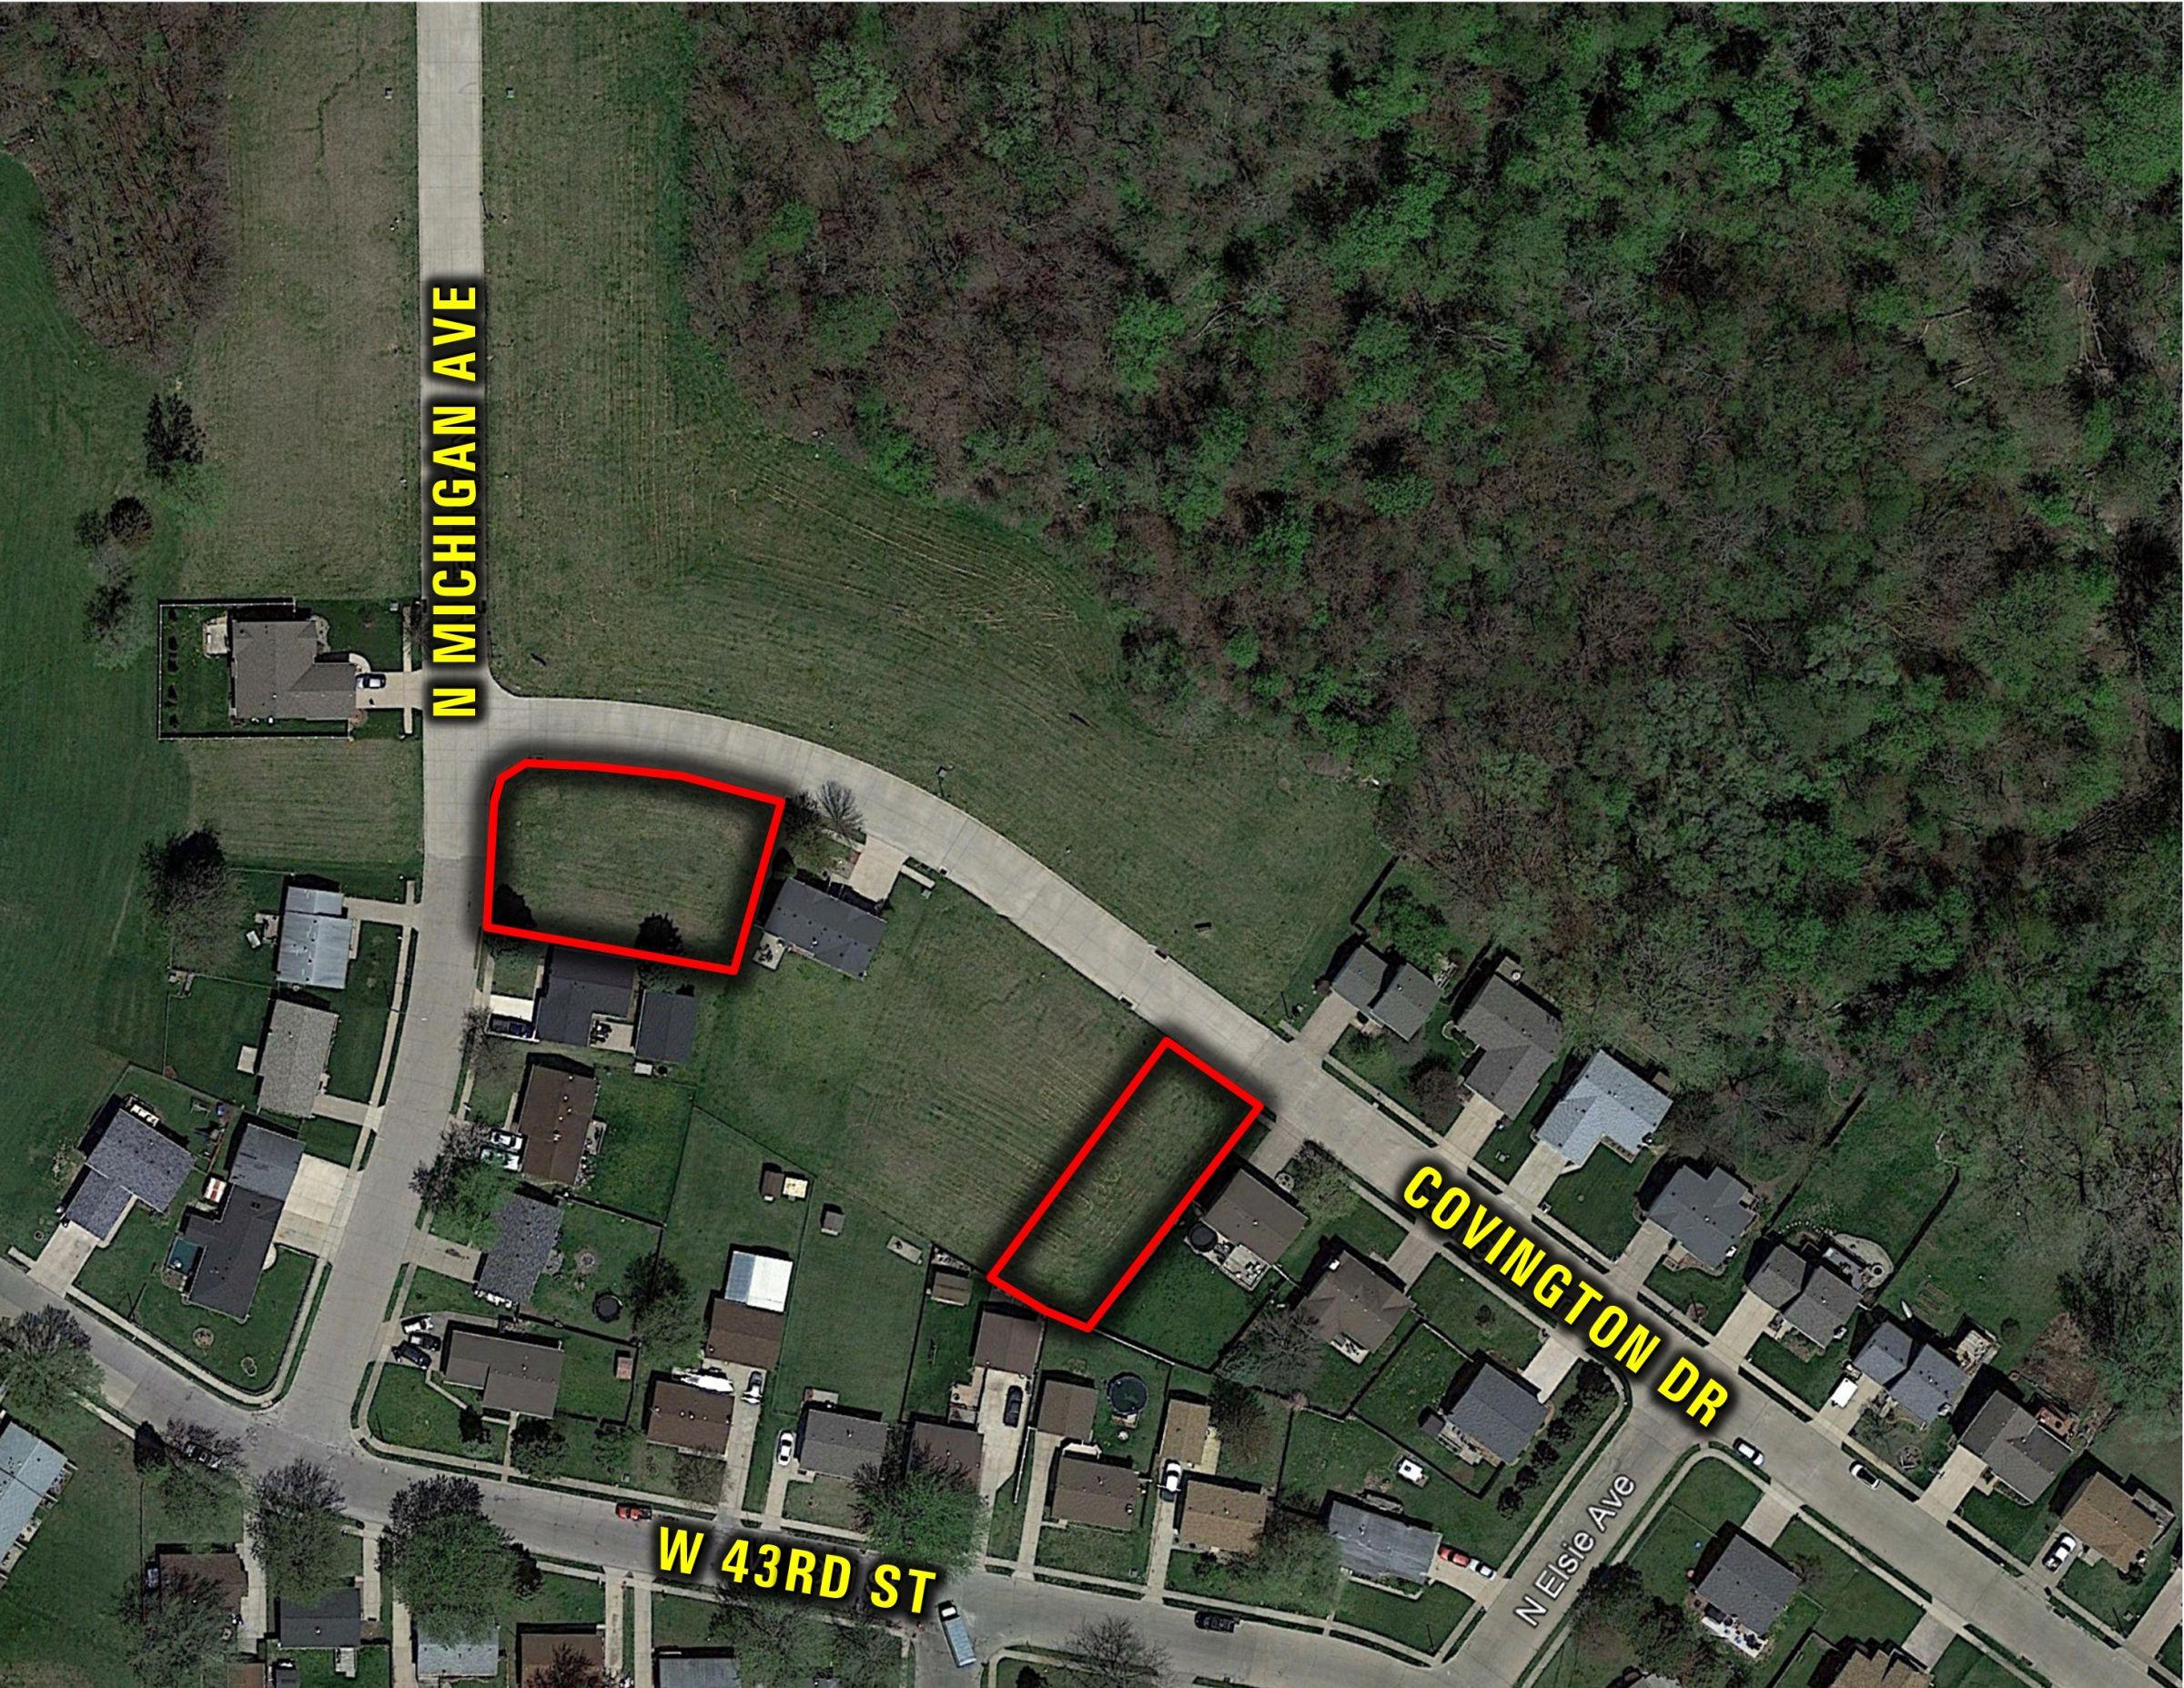 development-land-scott-county-iowa-0-acres-listing-number-15767-10-2021-09-22-040119.jpg